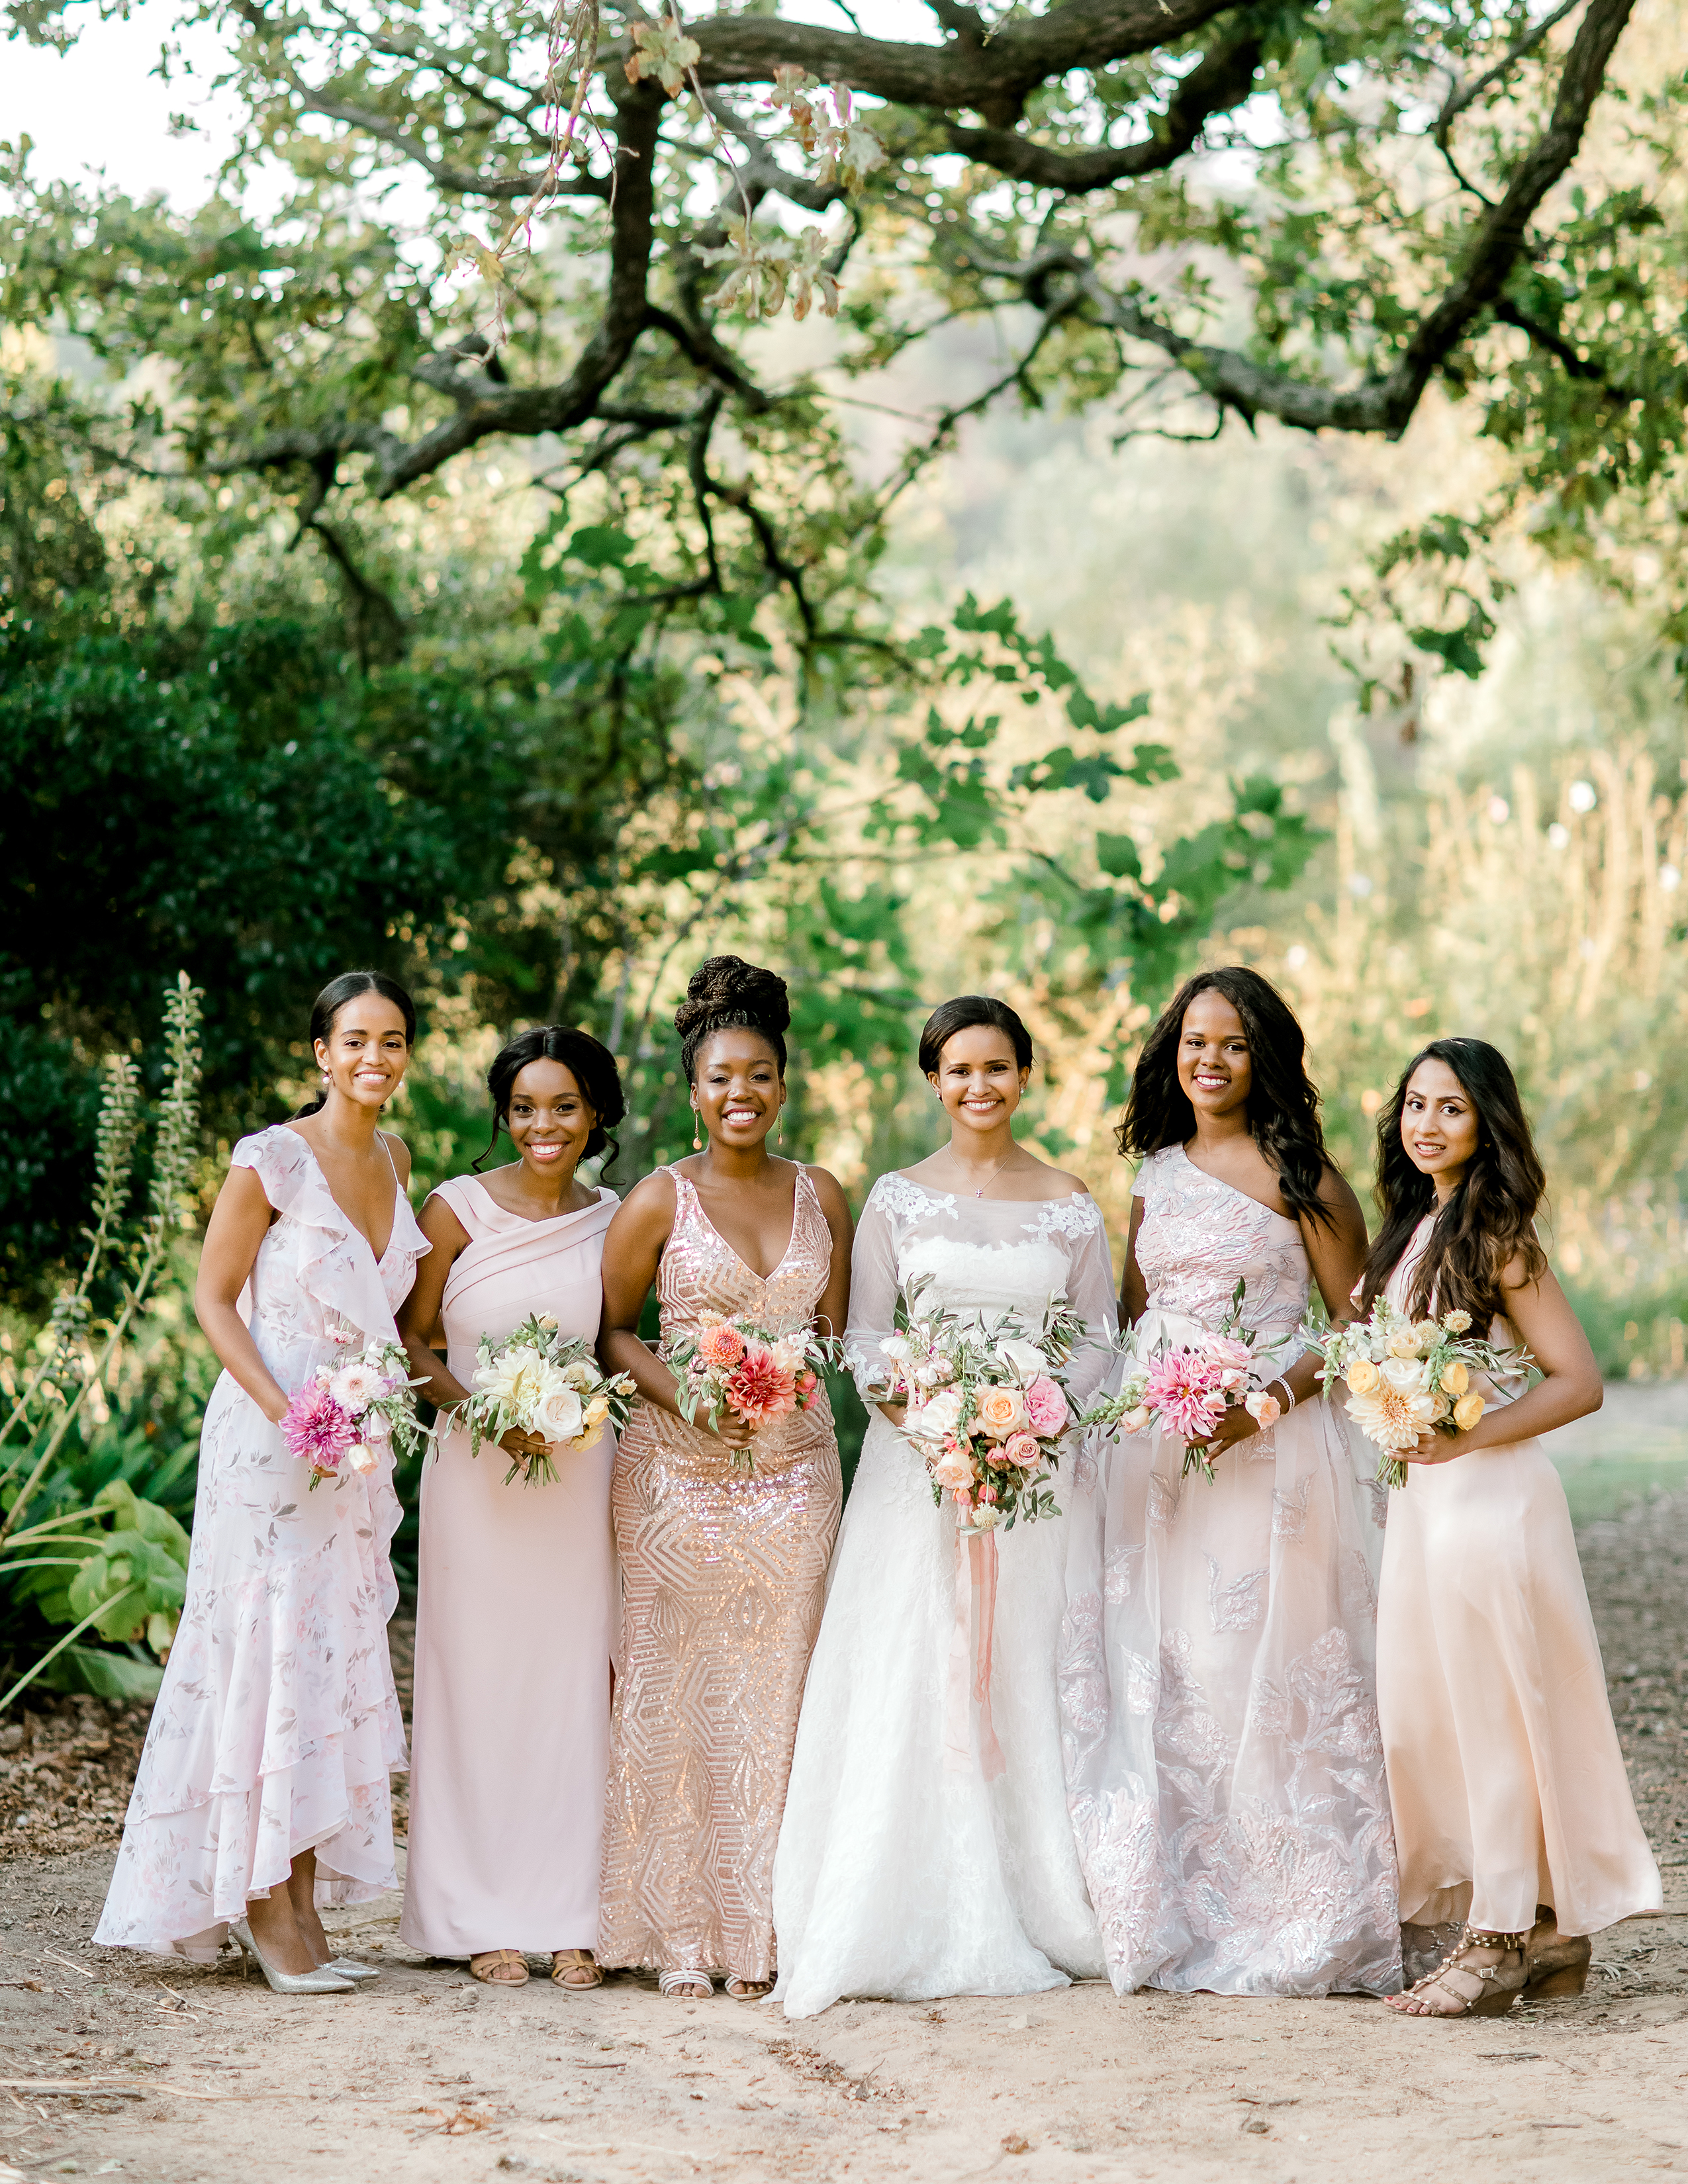 rorisang stephen wedding bridesmaids